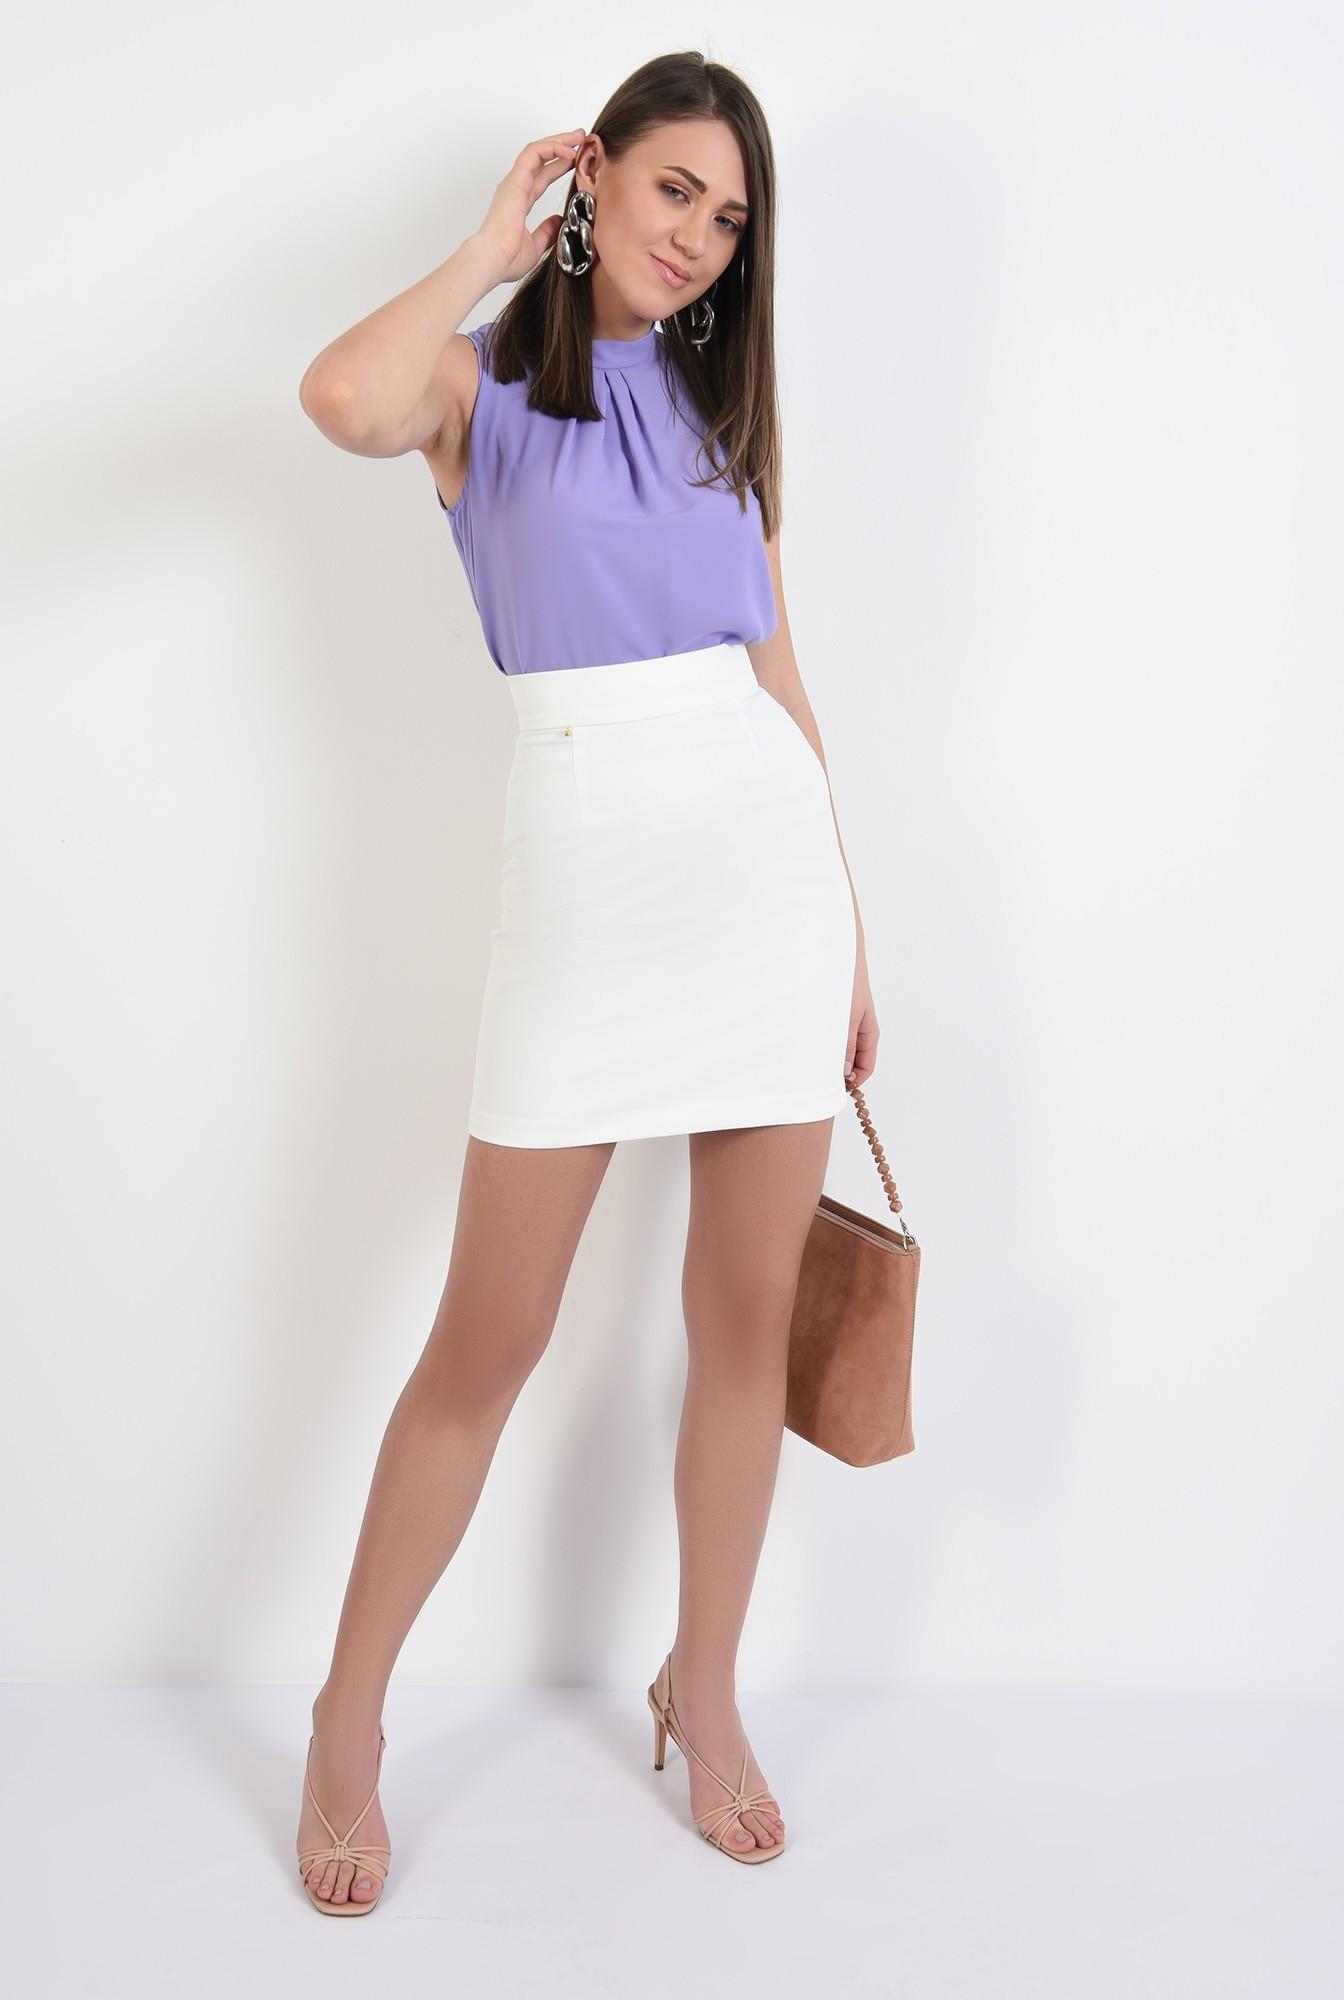 3 - bluza office, pliuri, guler mic, lila, bluza de primavara